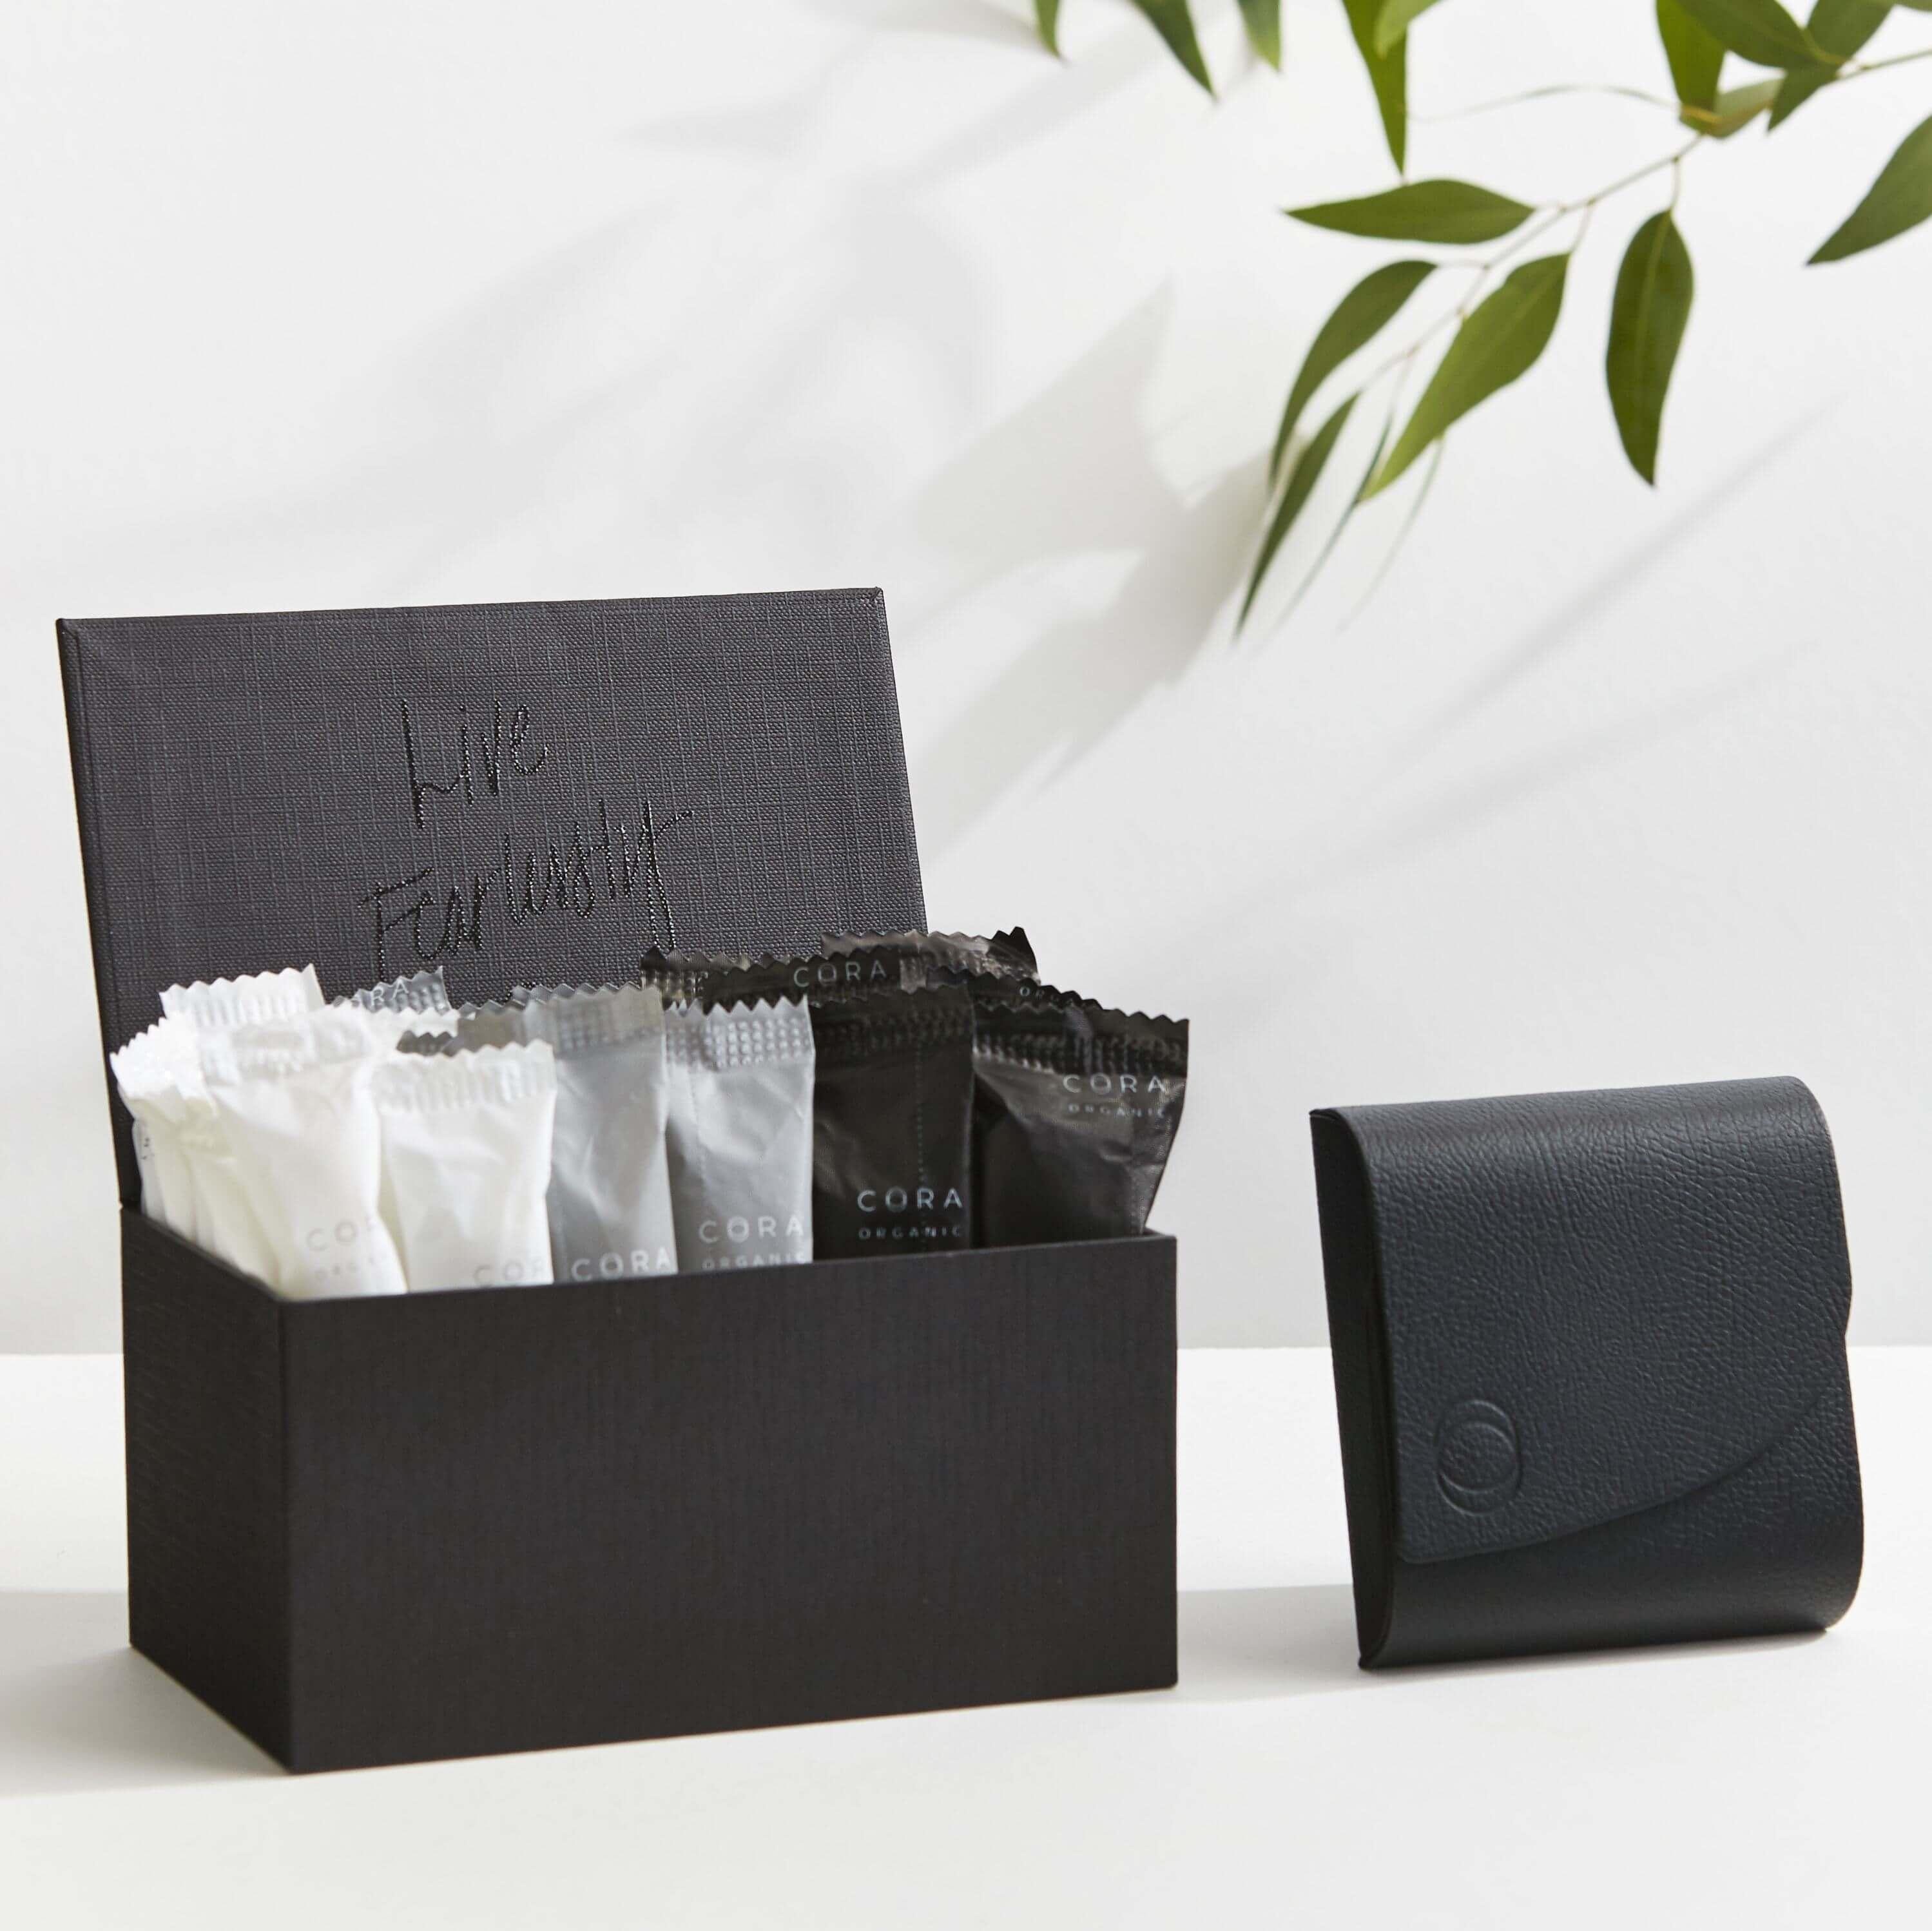 Top 4 Organic Tampons www.sarahkayhoffman.com #tampon #organic #healthyliving Cora tampons